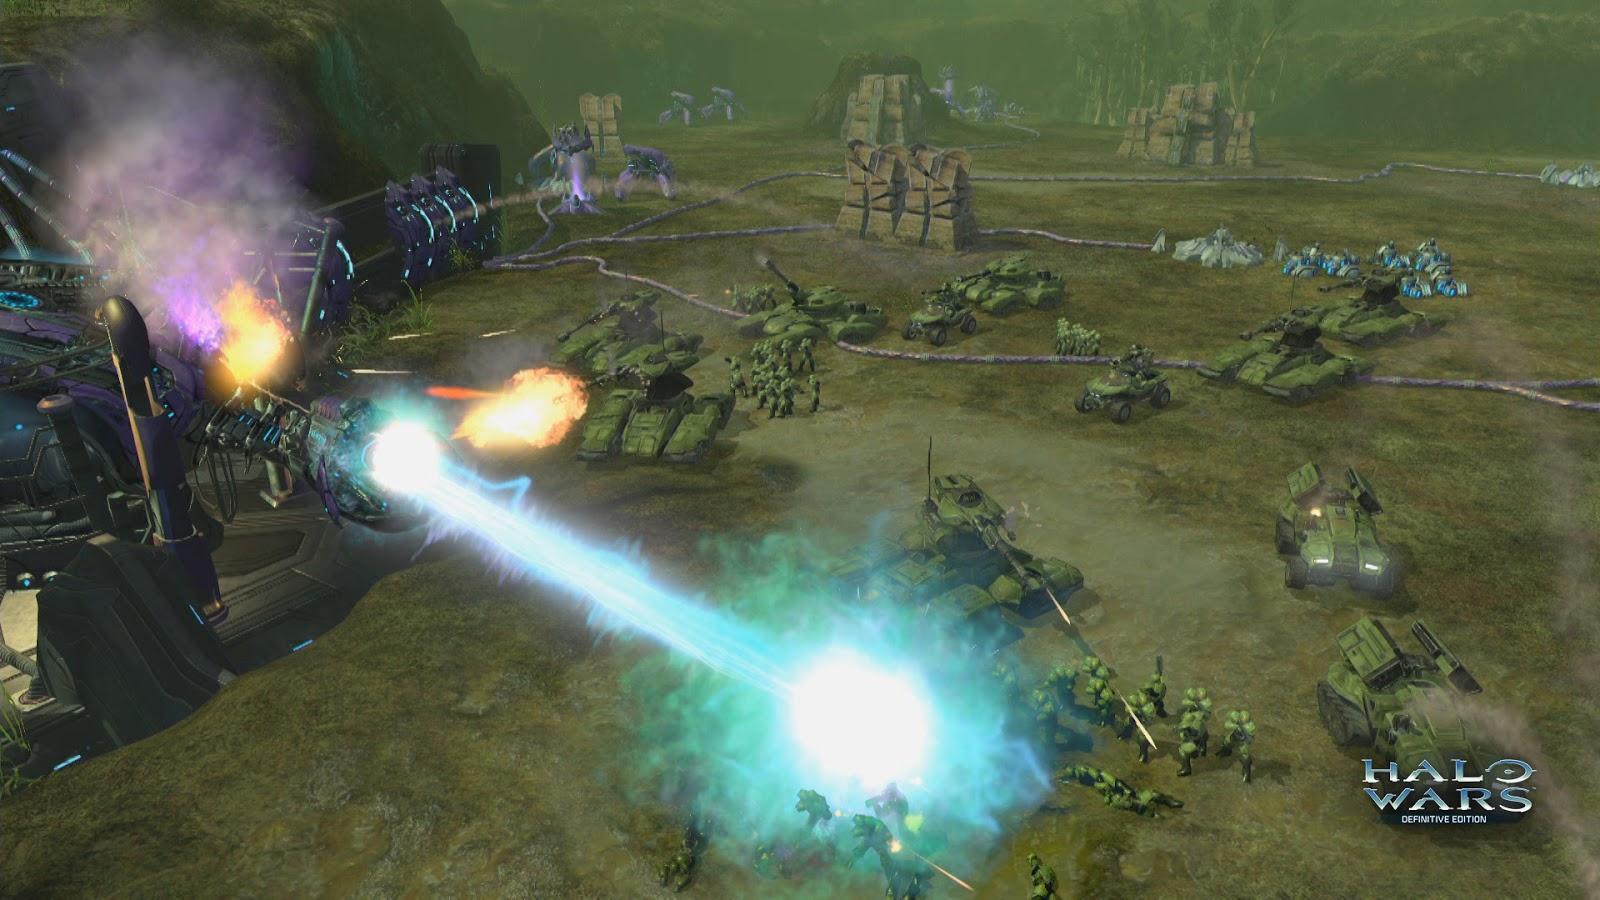 Halo Wars Definitive Edition ESPAÑOL PC Full + Hotfix 2 (CODEX) + REPACK 2 DVD5 (JPW) 3